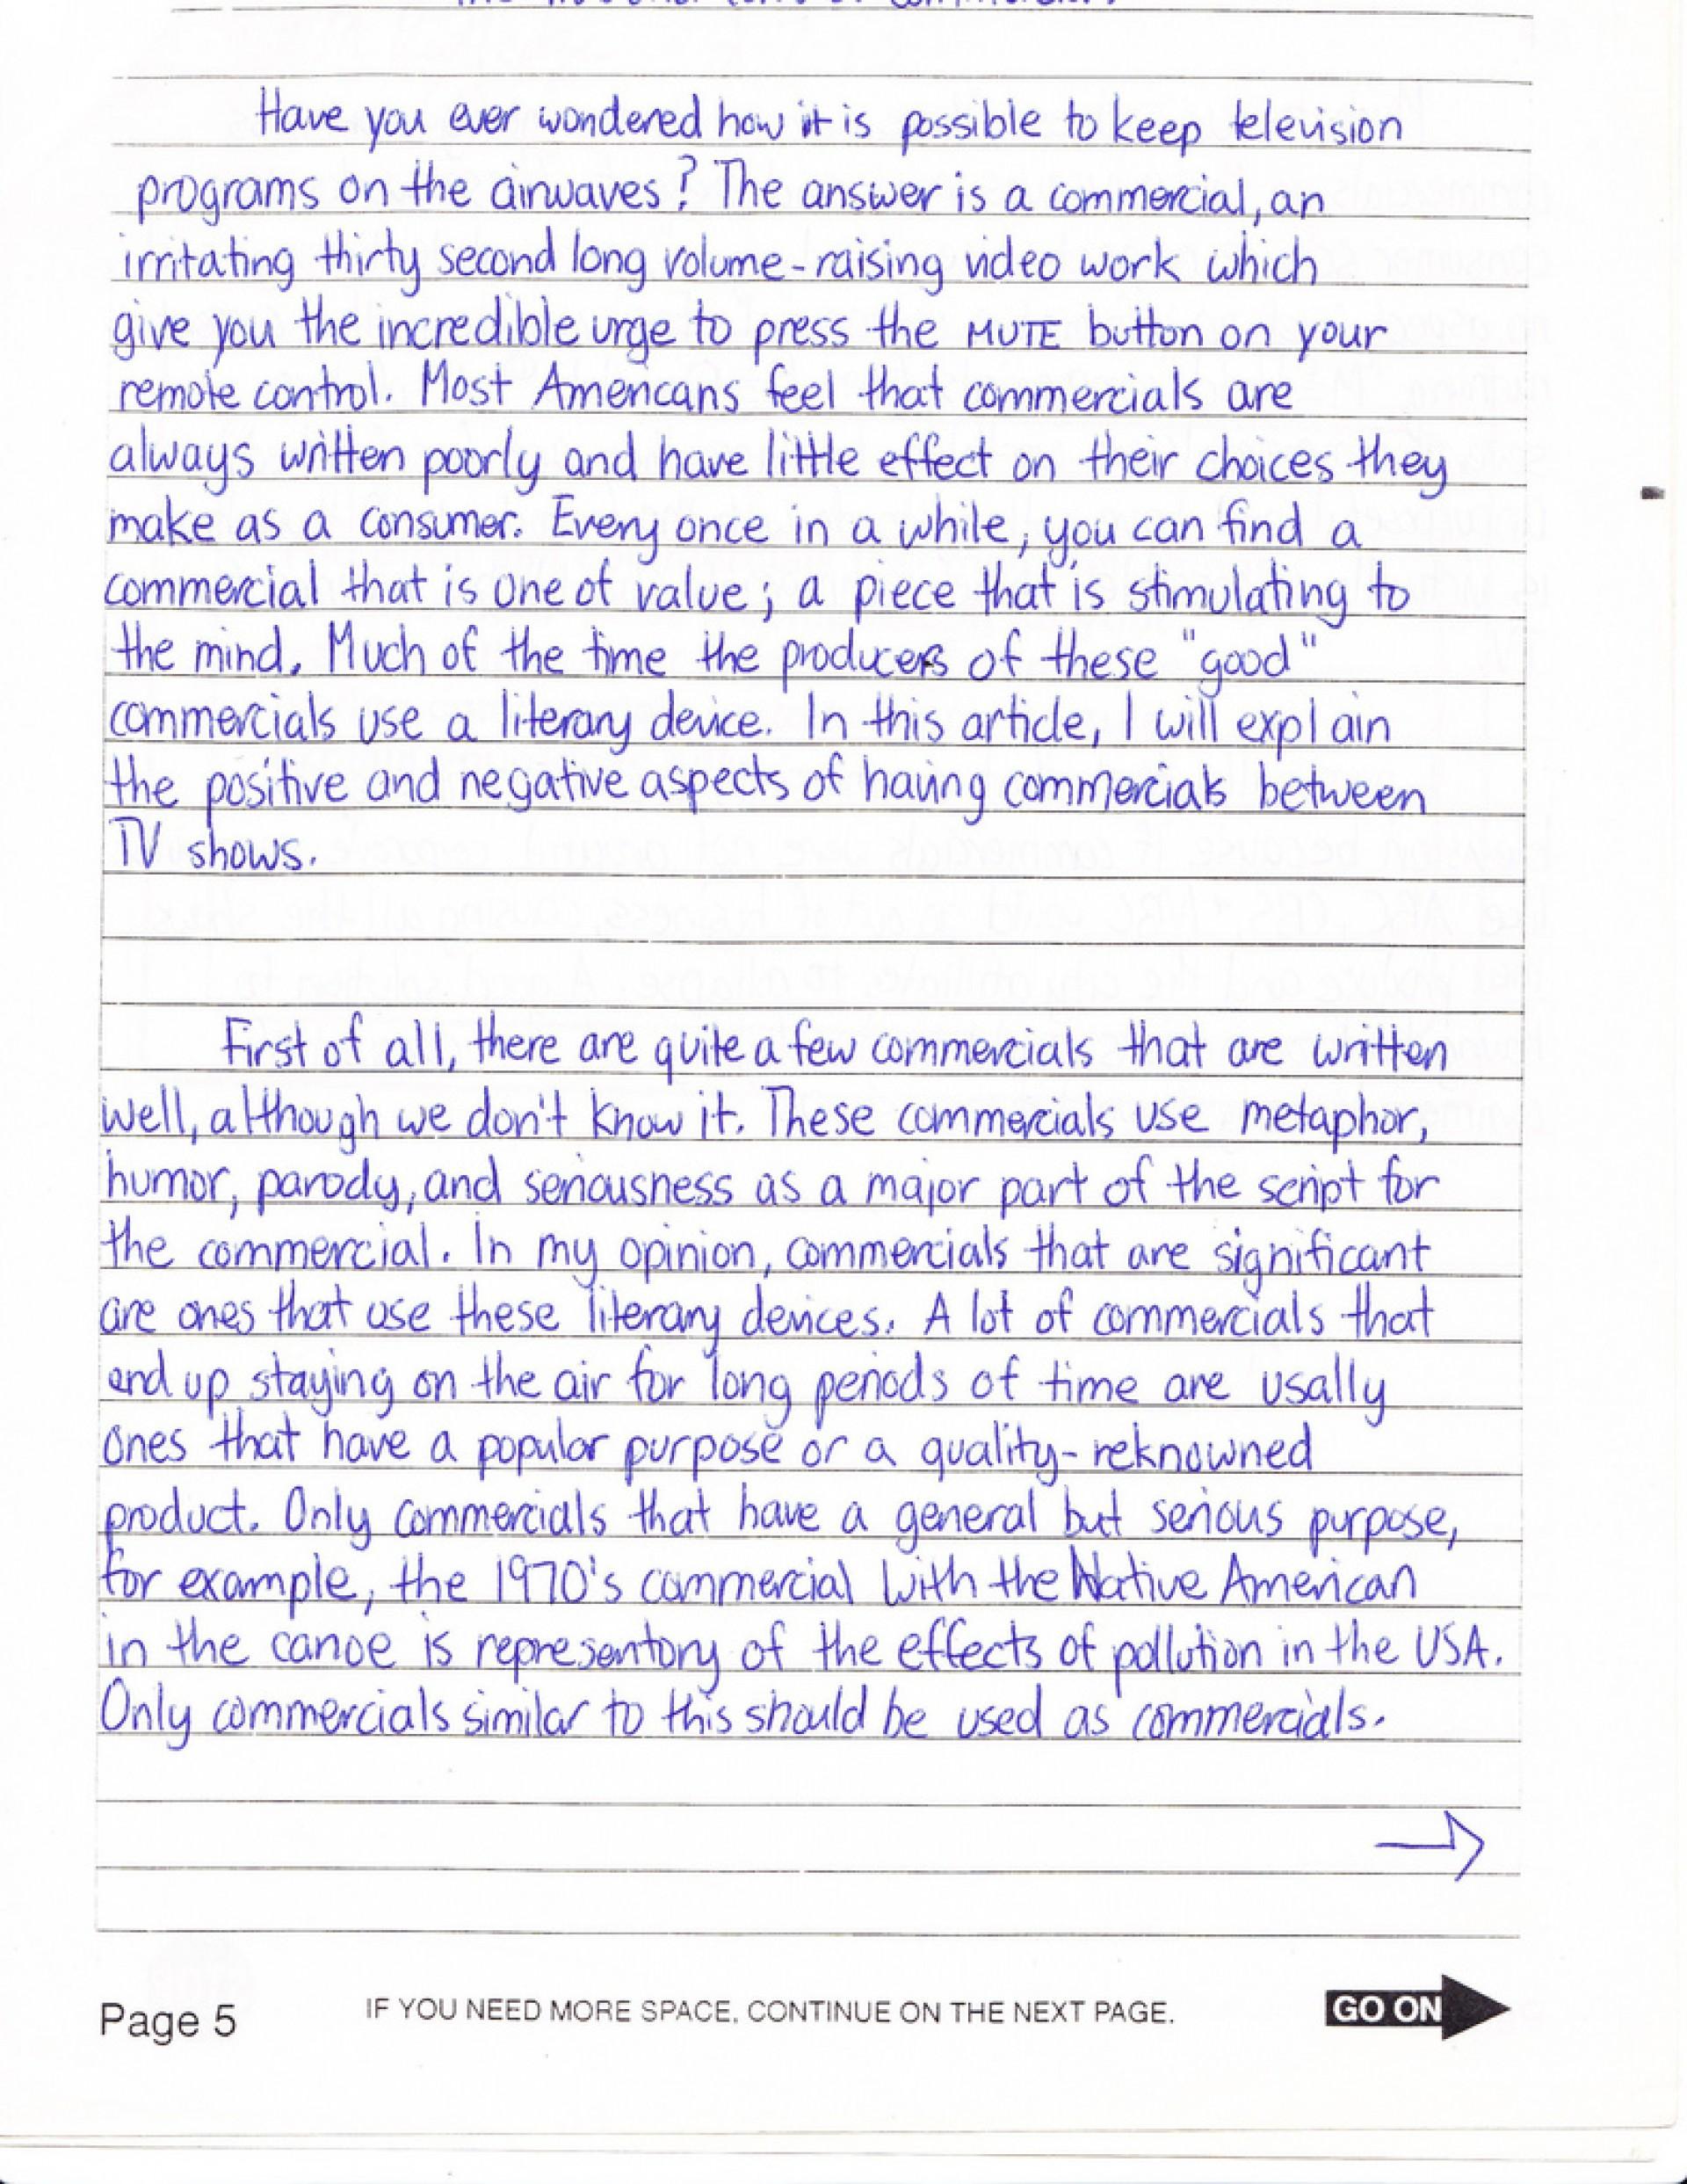 003 Sat Essay Average Score Tips Singular Pdf Writing Prepscholar 1920